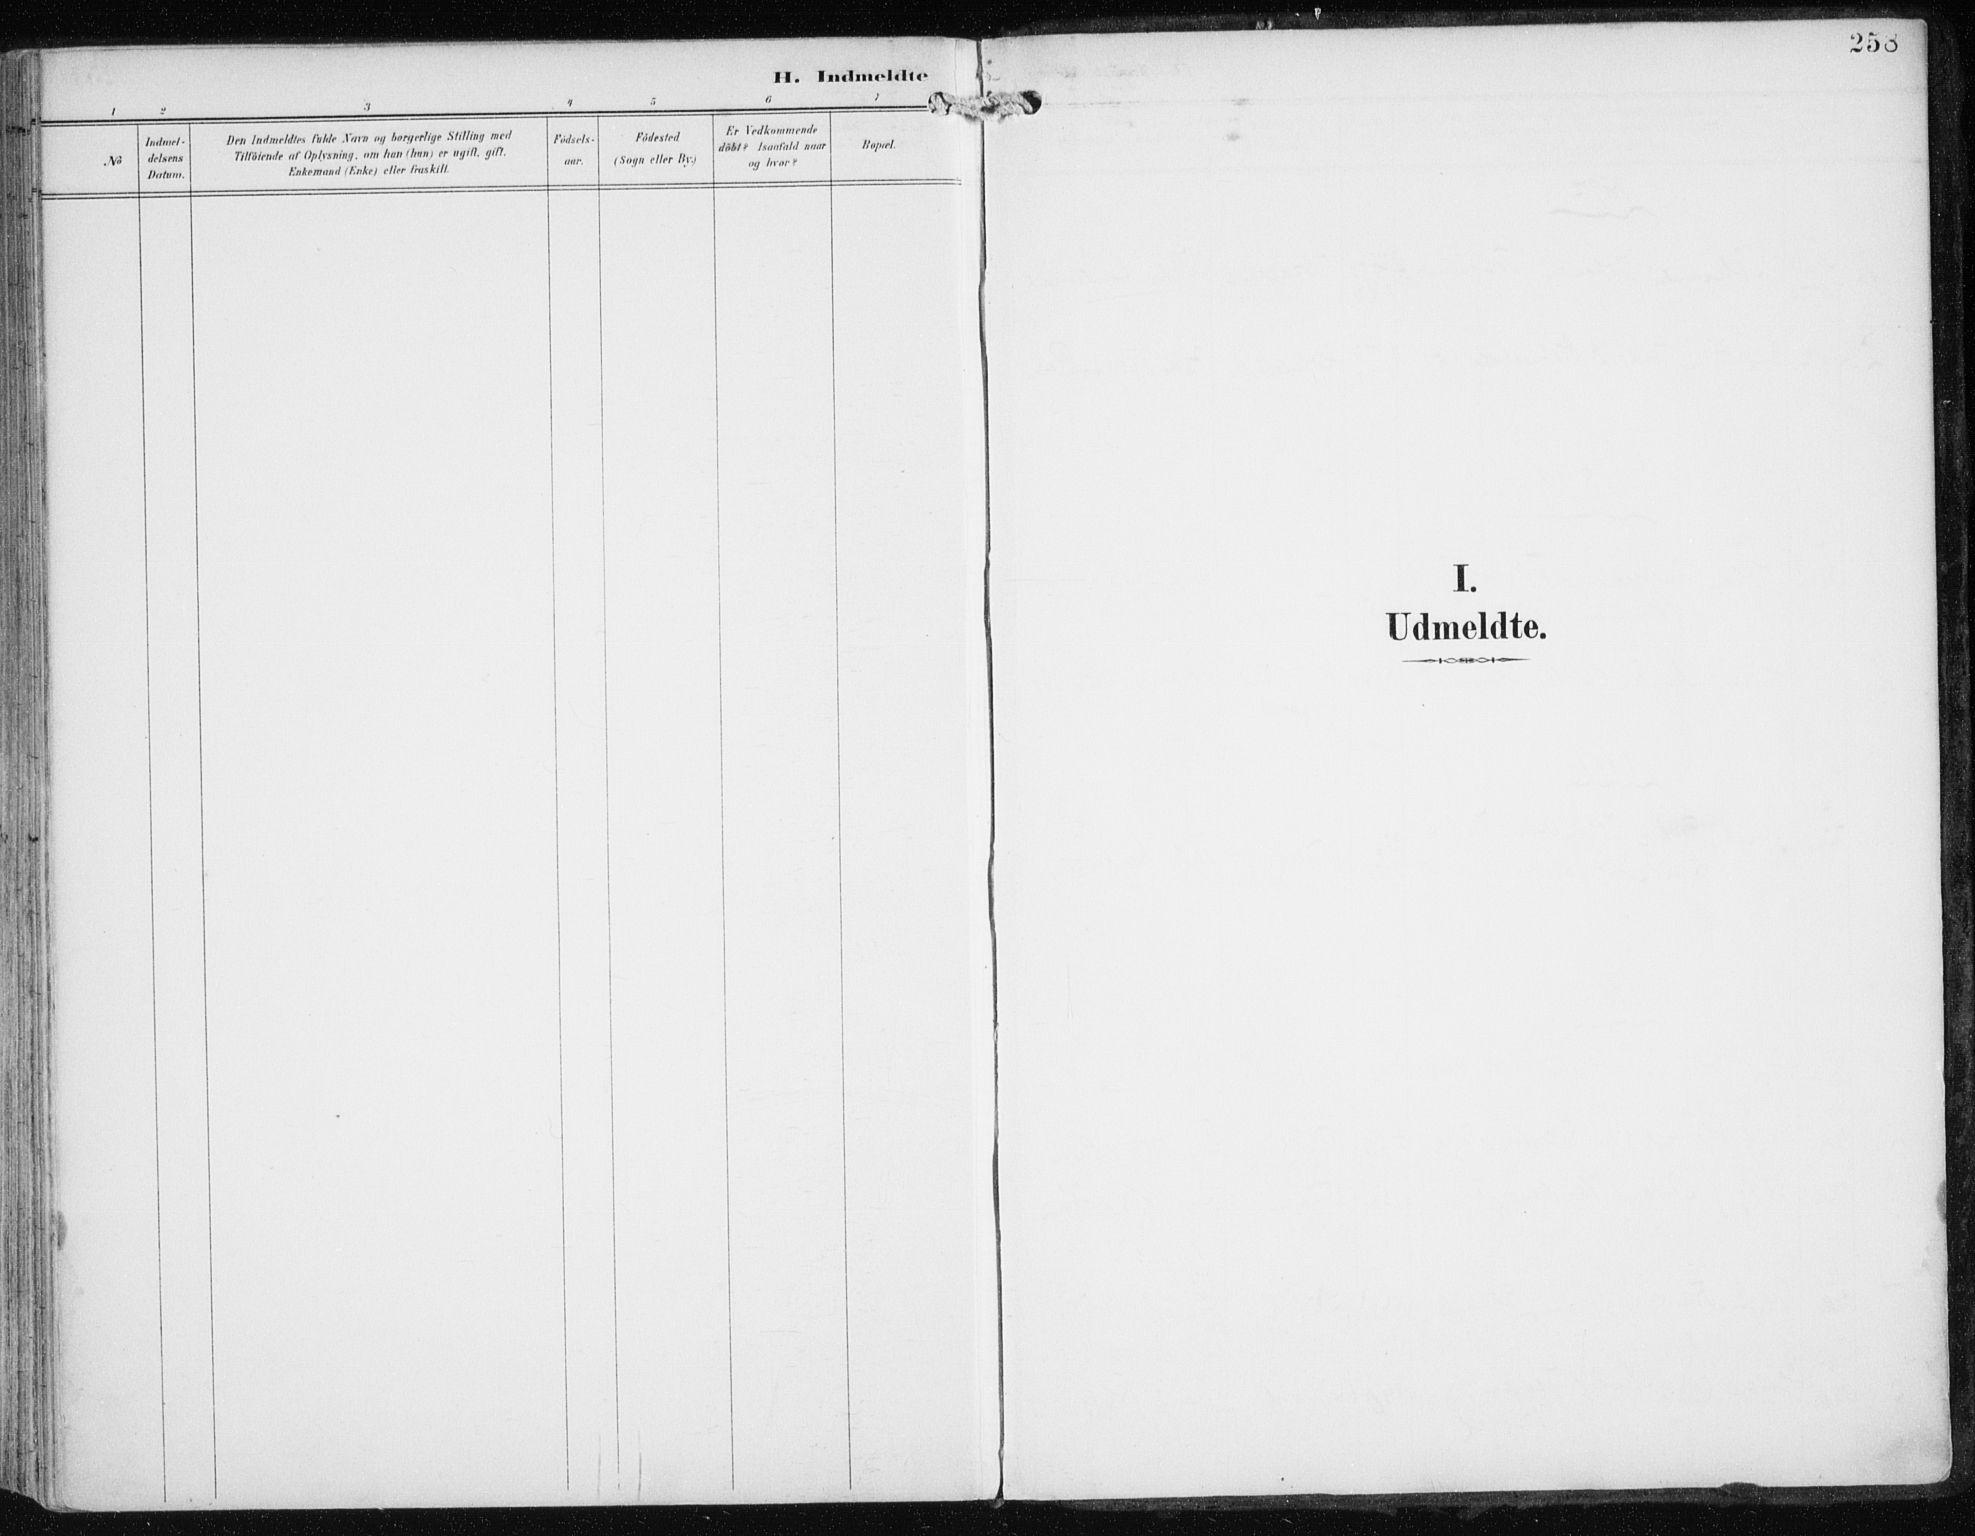 SATØ, Skjervøy sokneprestkontor, H/Ha/Haa/L0017kirke: Ministerialbok nr. 17, 1895-1911, s. 258